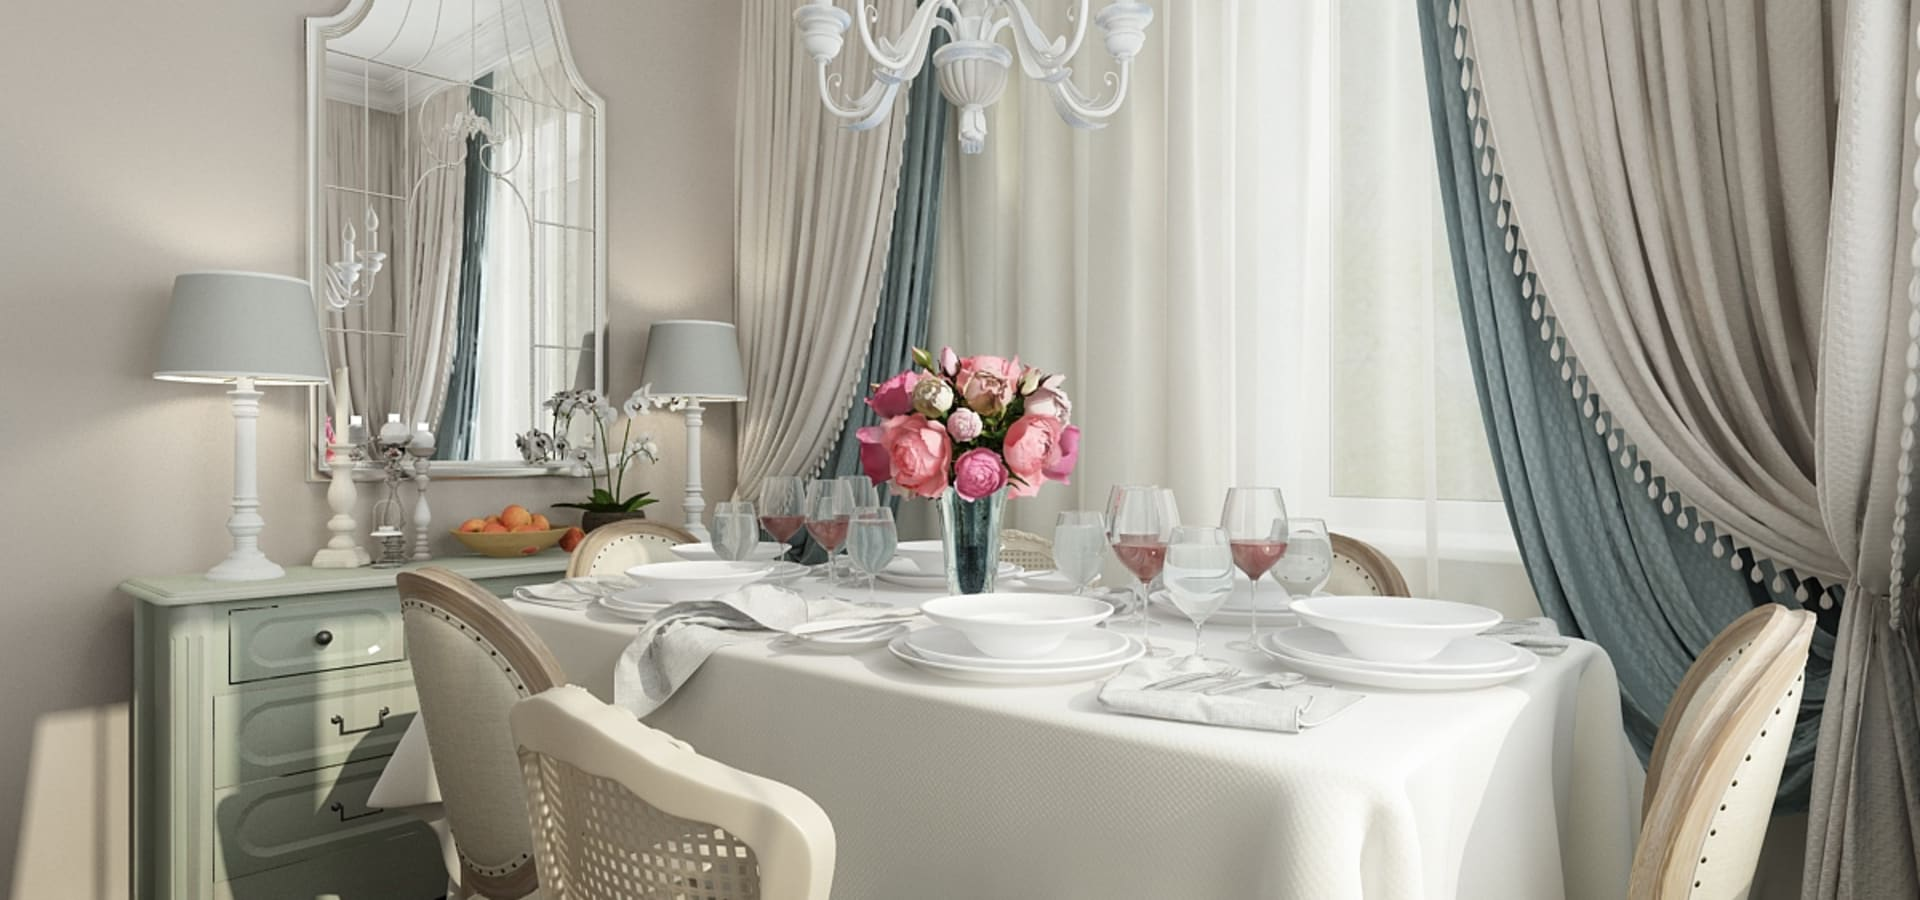 The Аrt of interior from Olga Kalinina